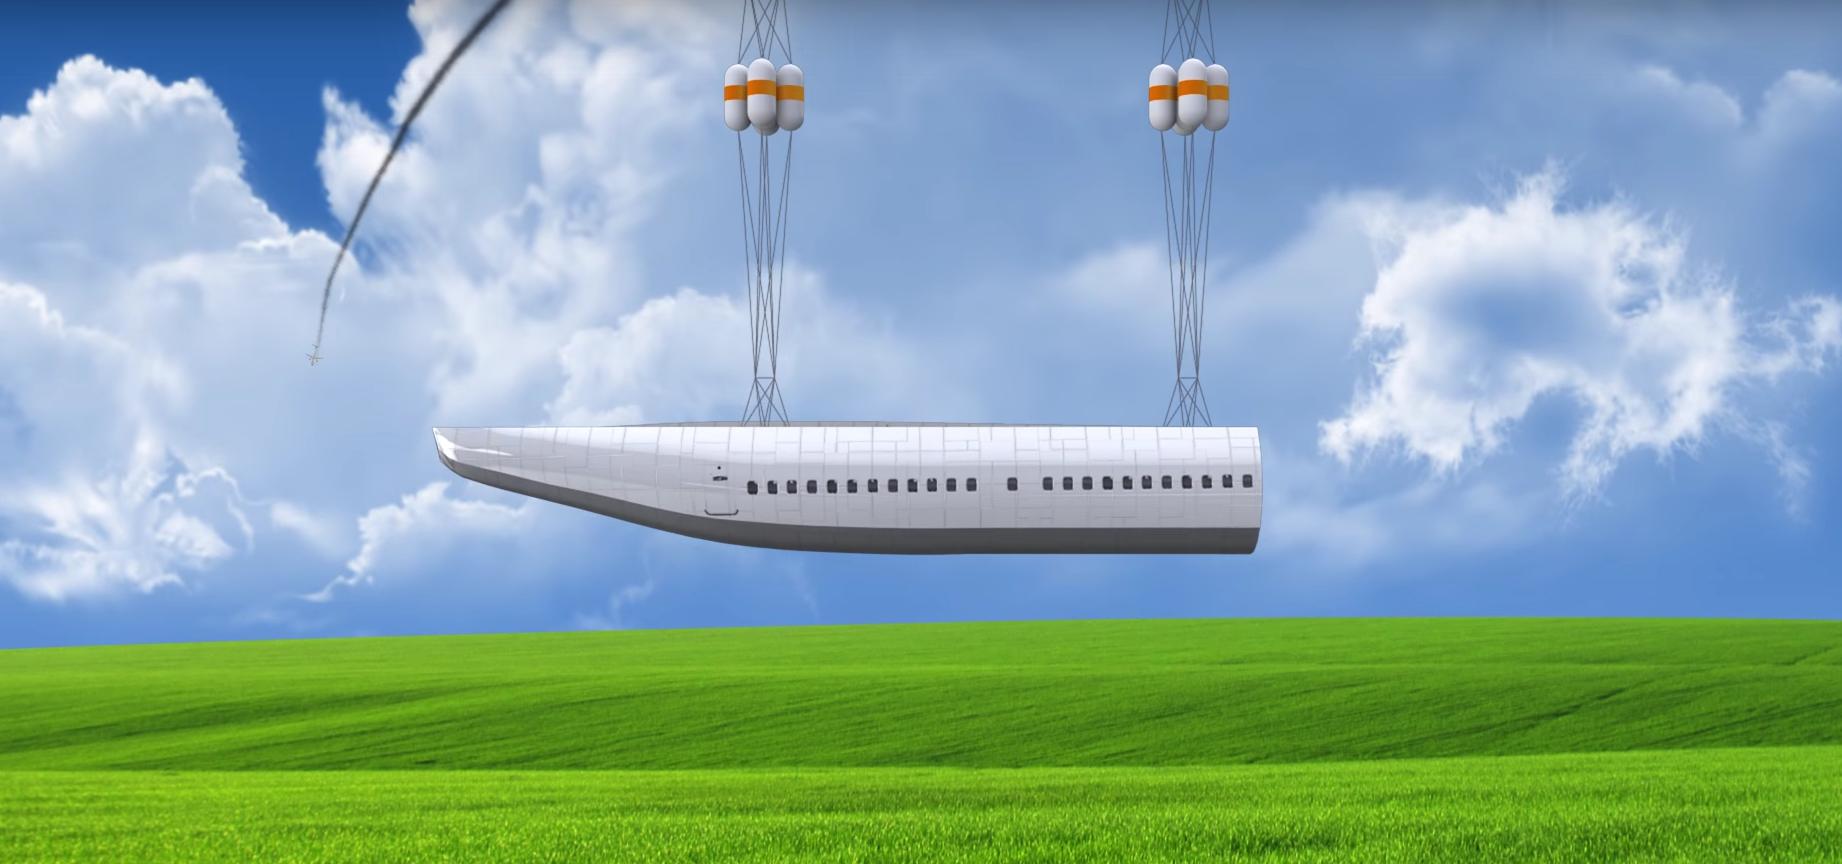 cabina avion desmontable segura 9